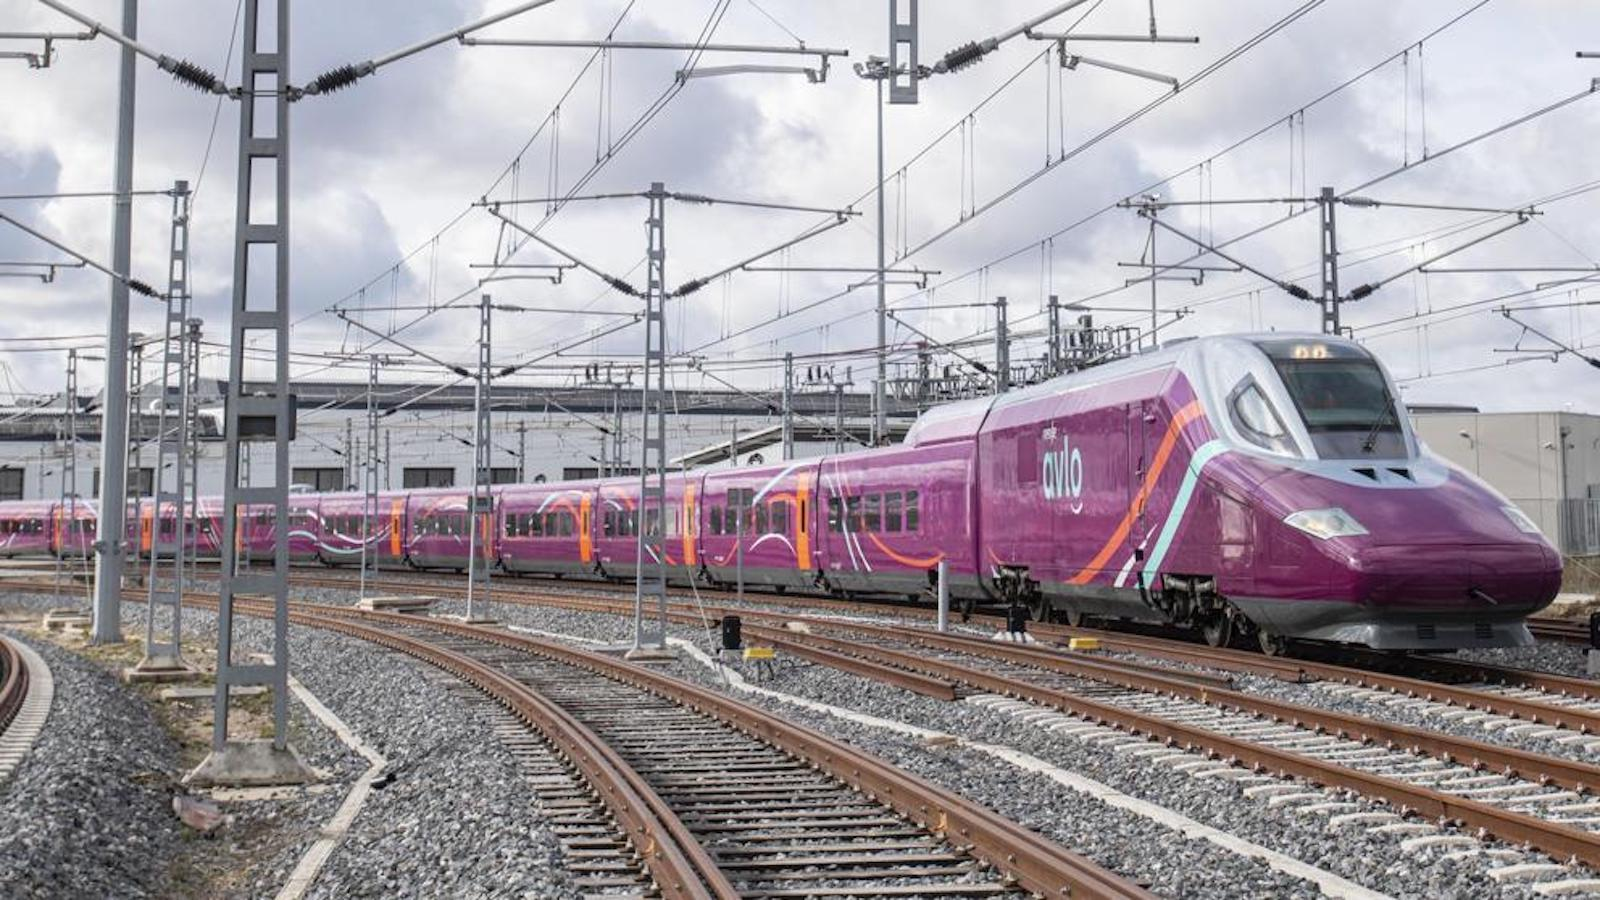 Tren de l'AVLO, l'AVE 'low cost' / Europa Press